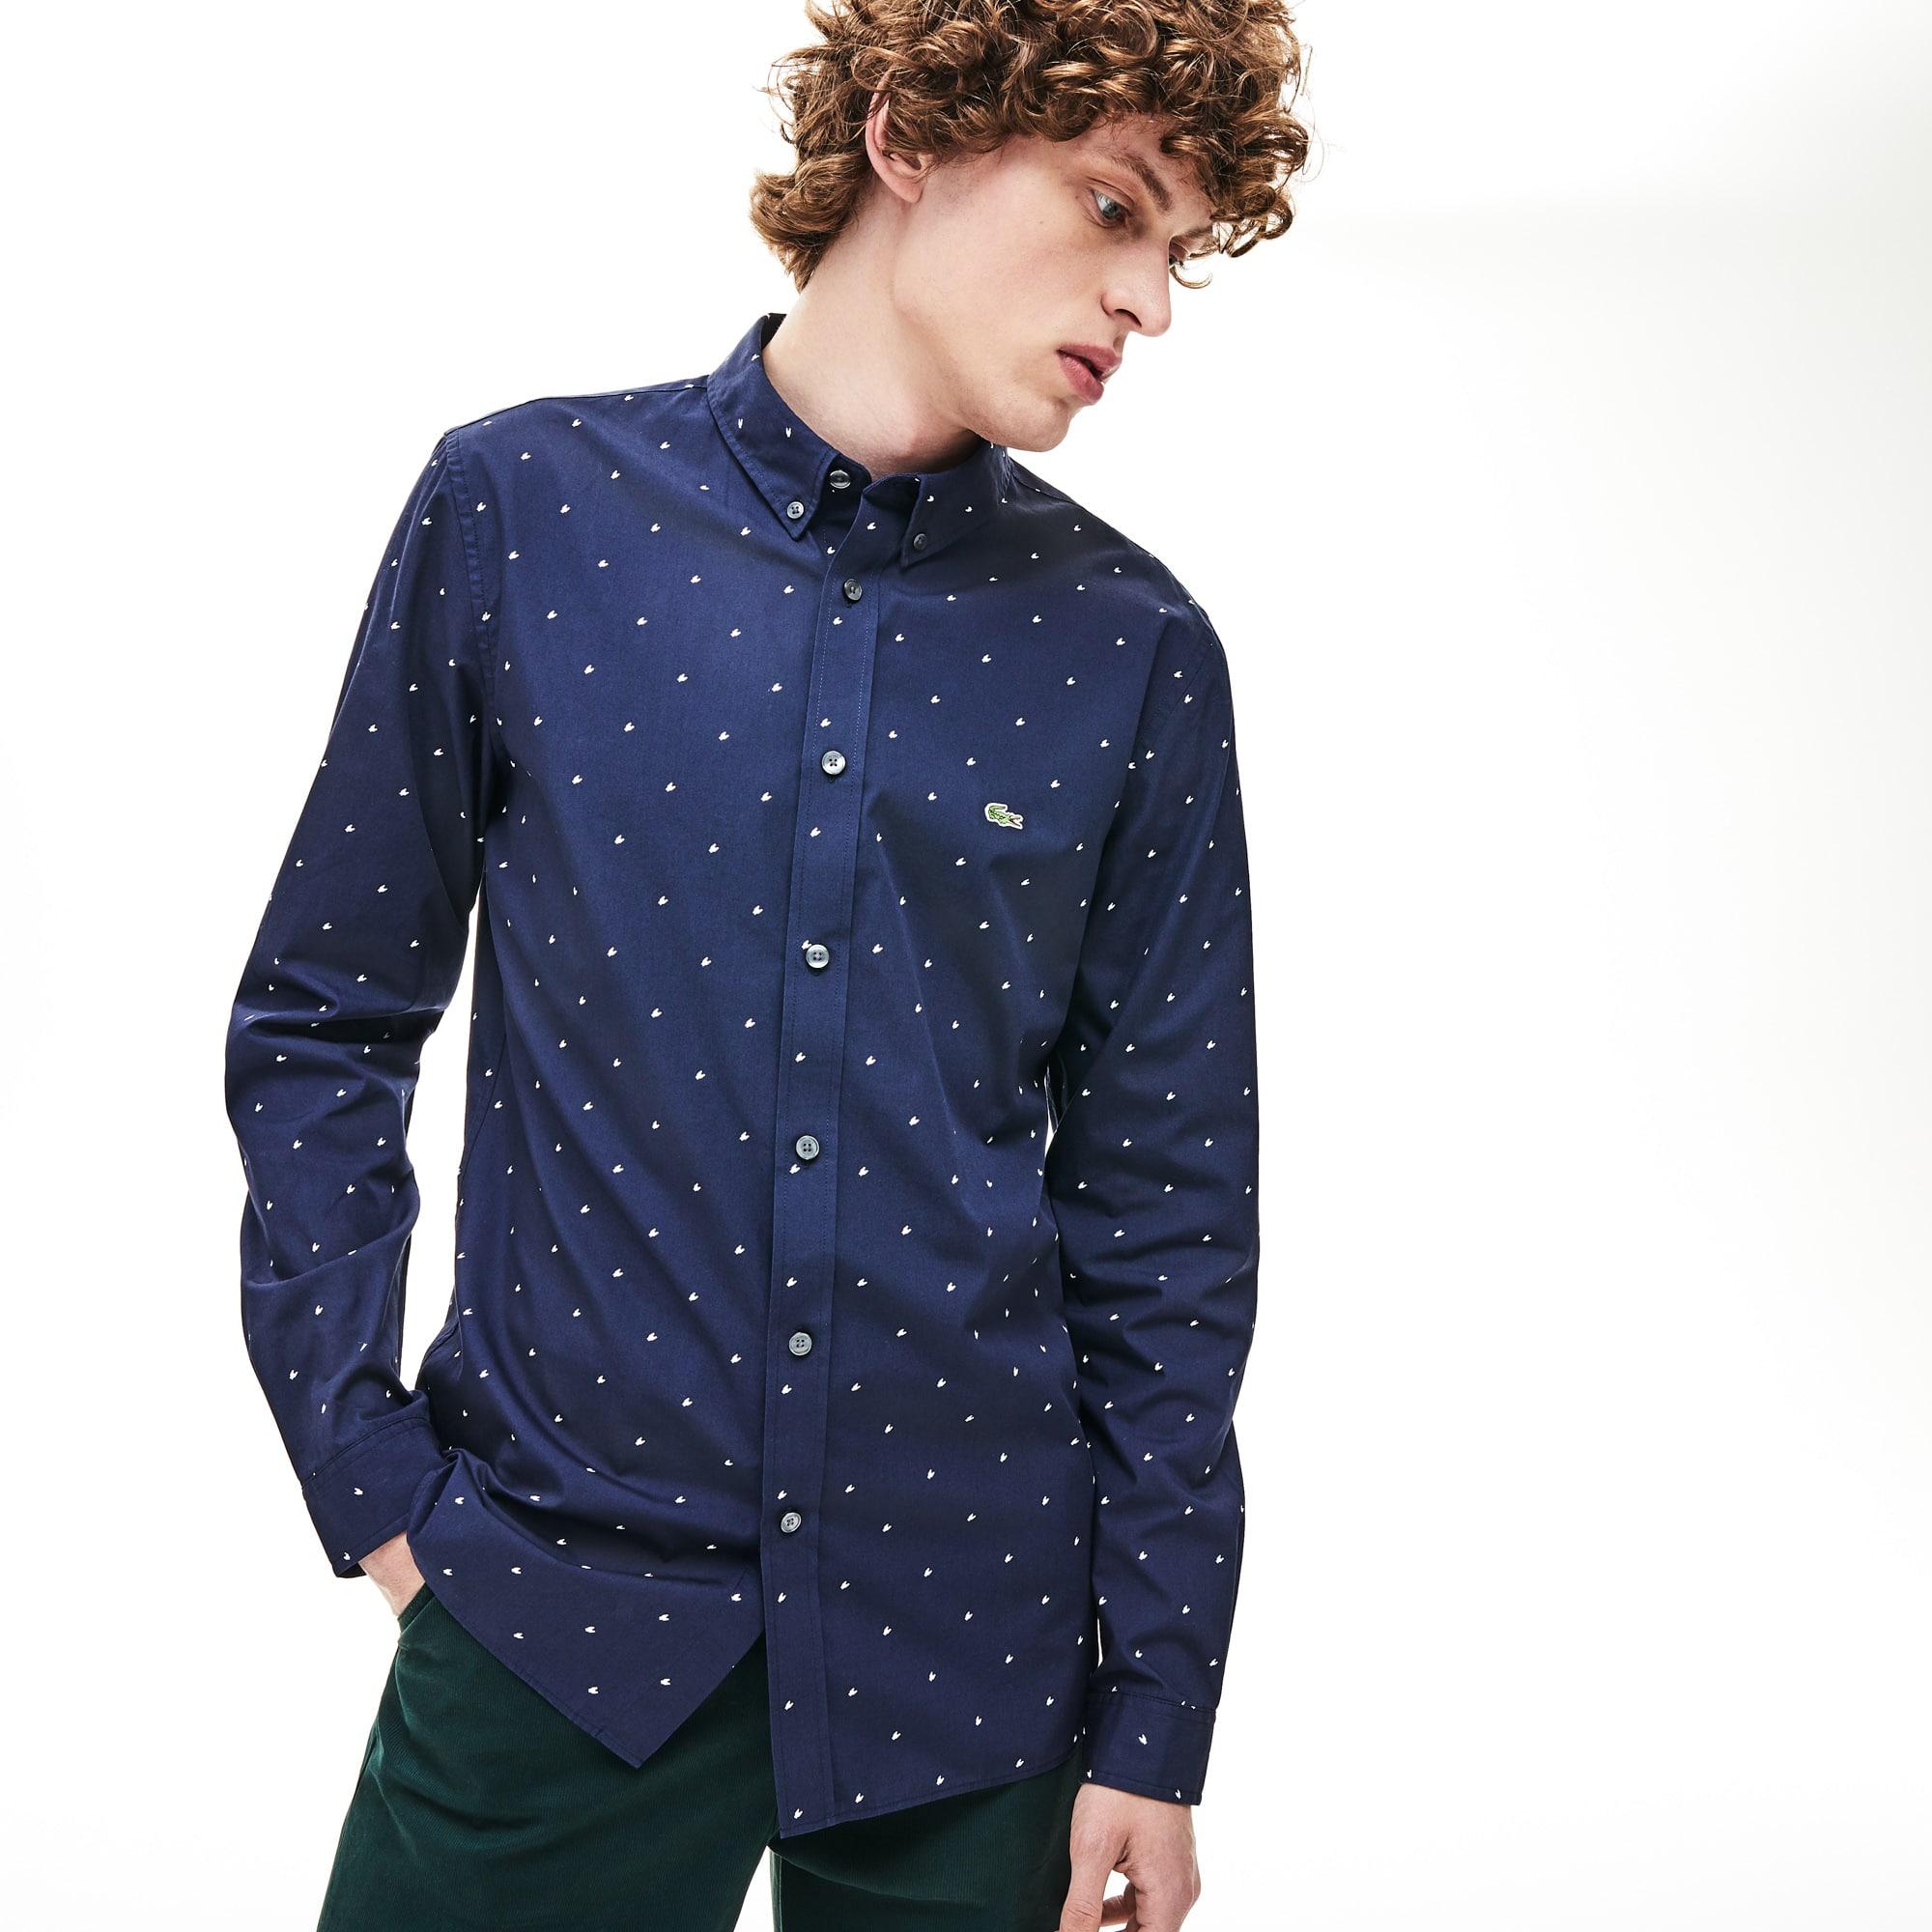 dc4e31f0 Shirts for men   Men's fashion   LACOSTE